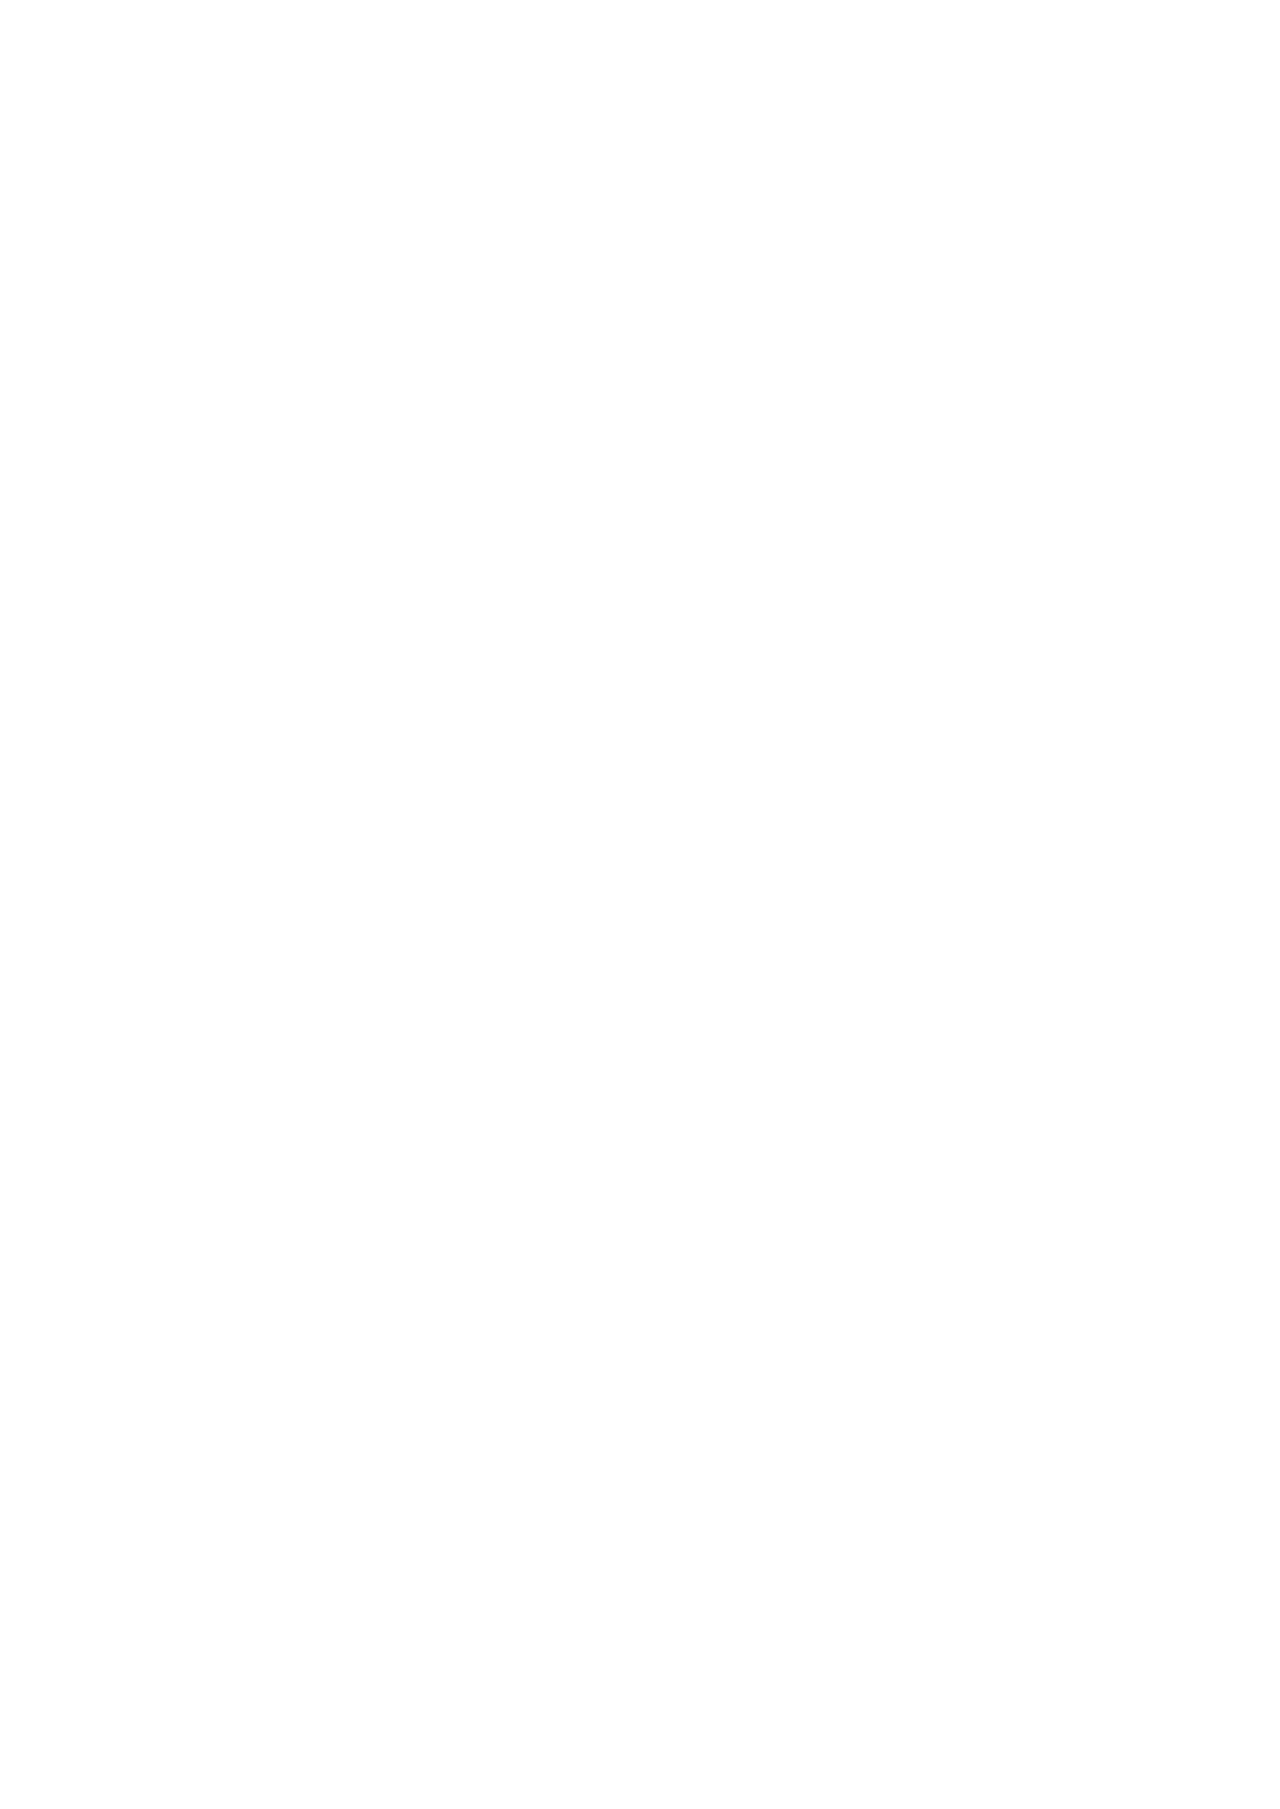 Higurashi May Cry? 1